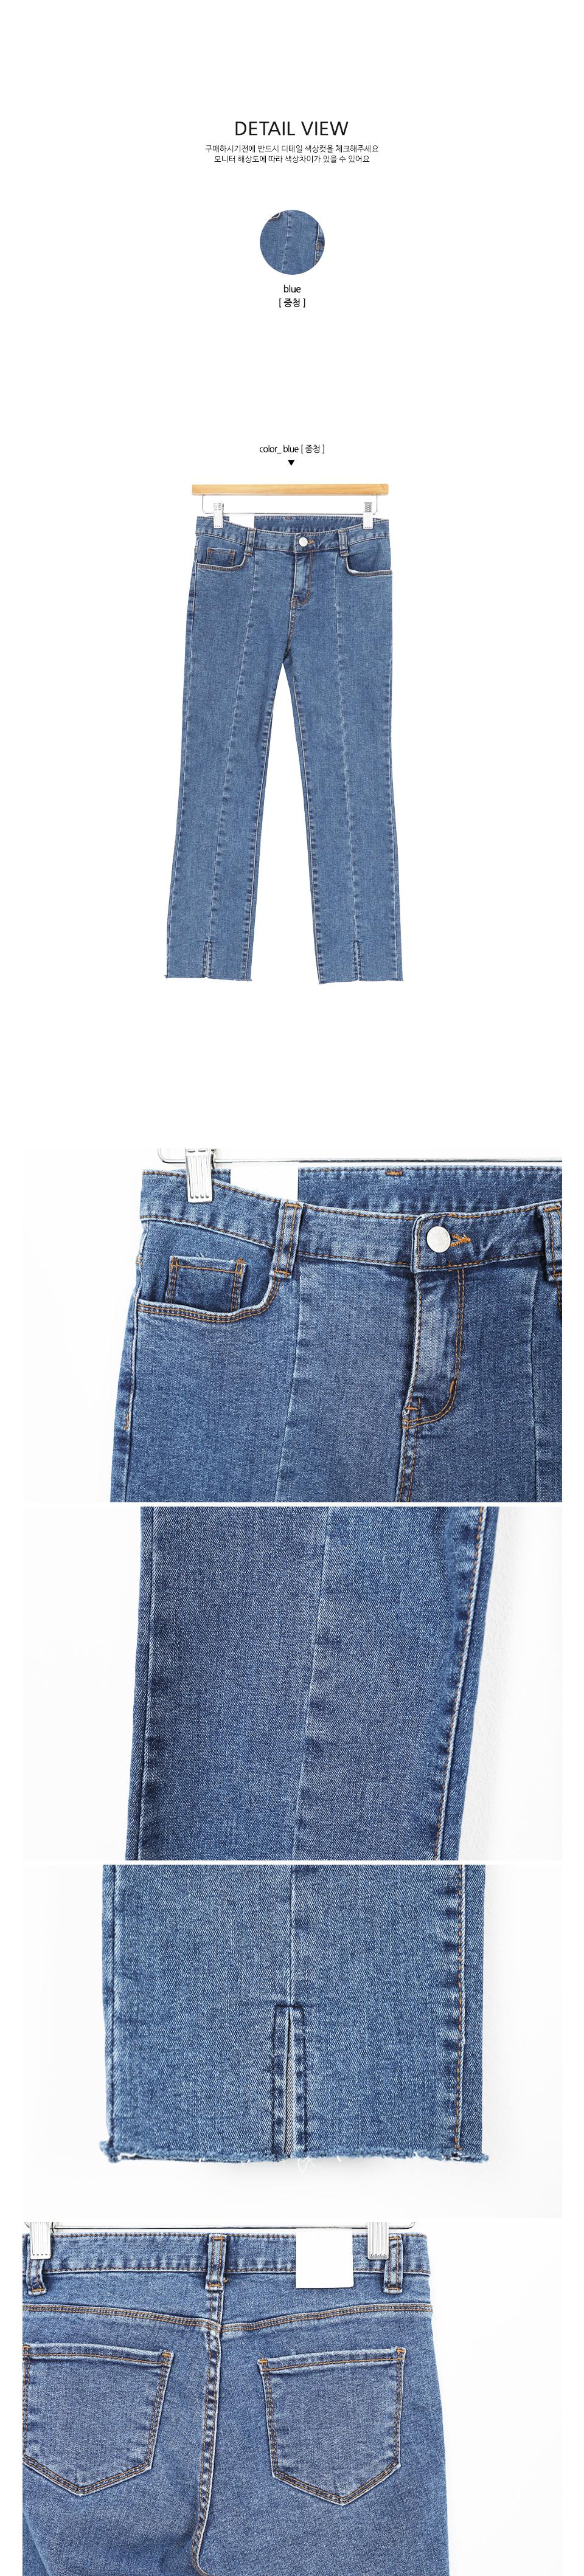 NanaTime Date Pants